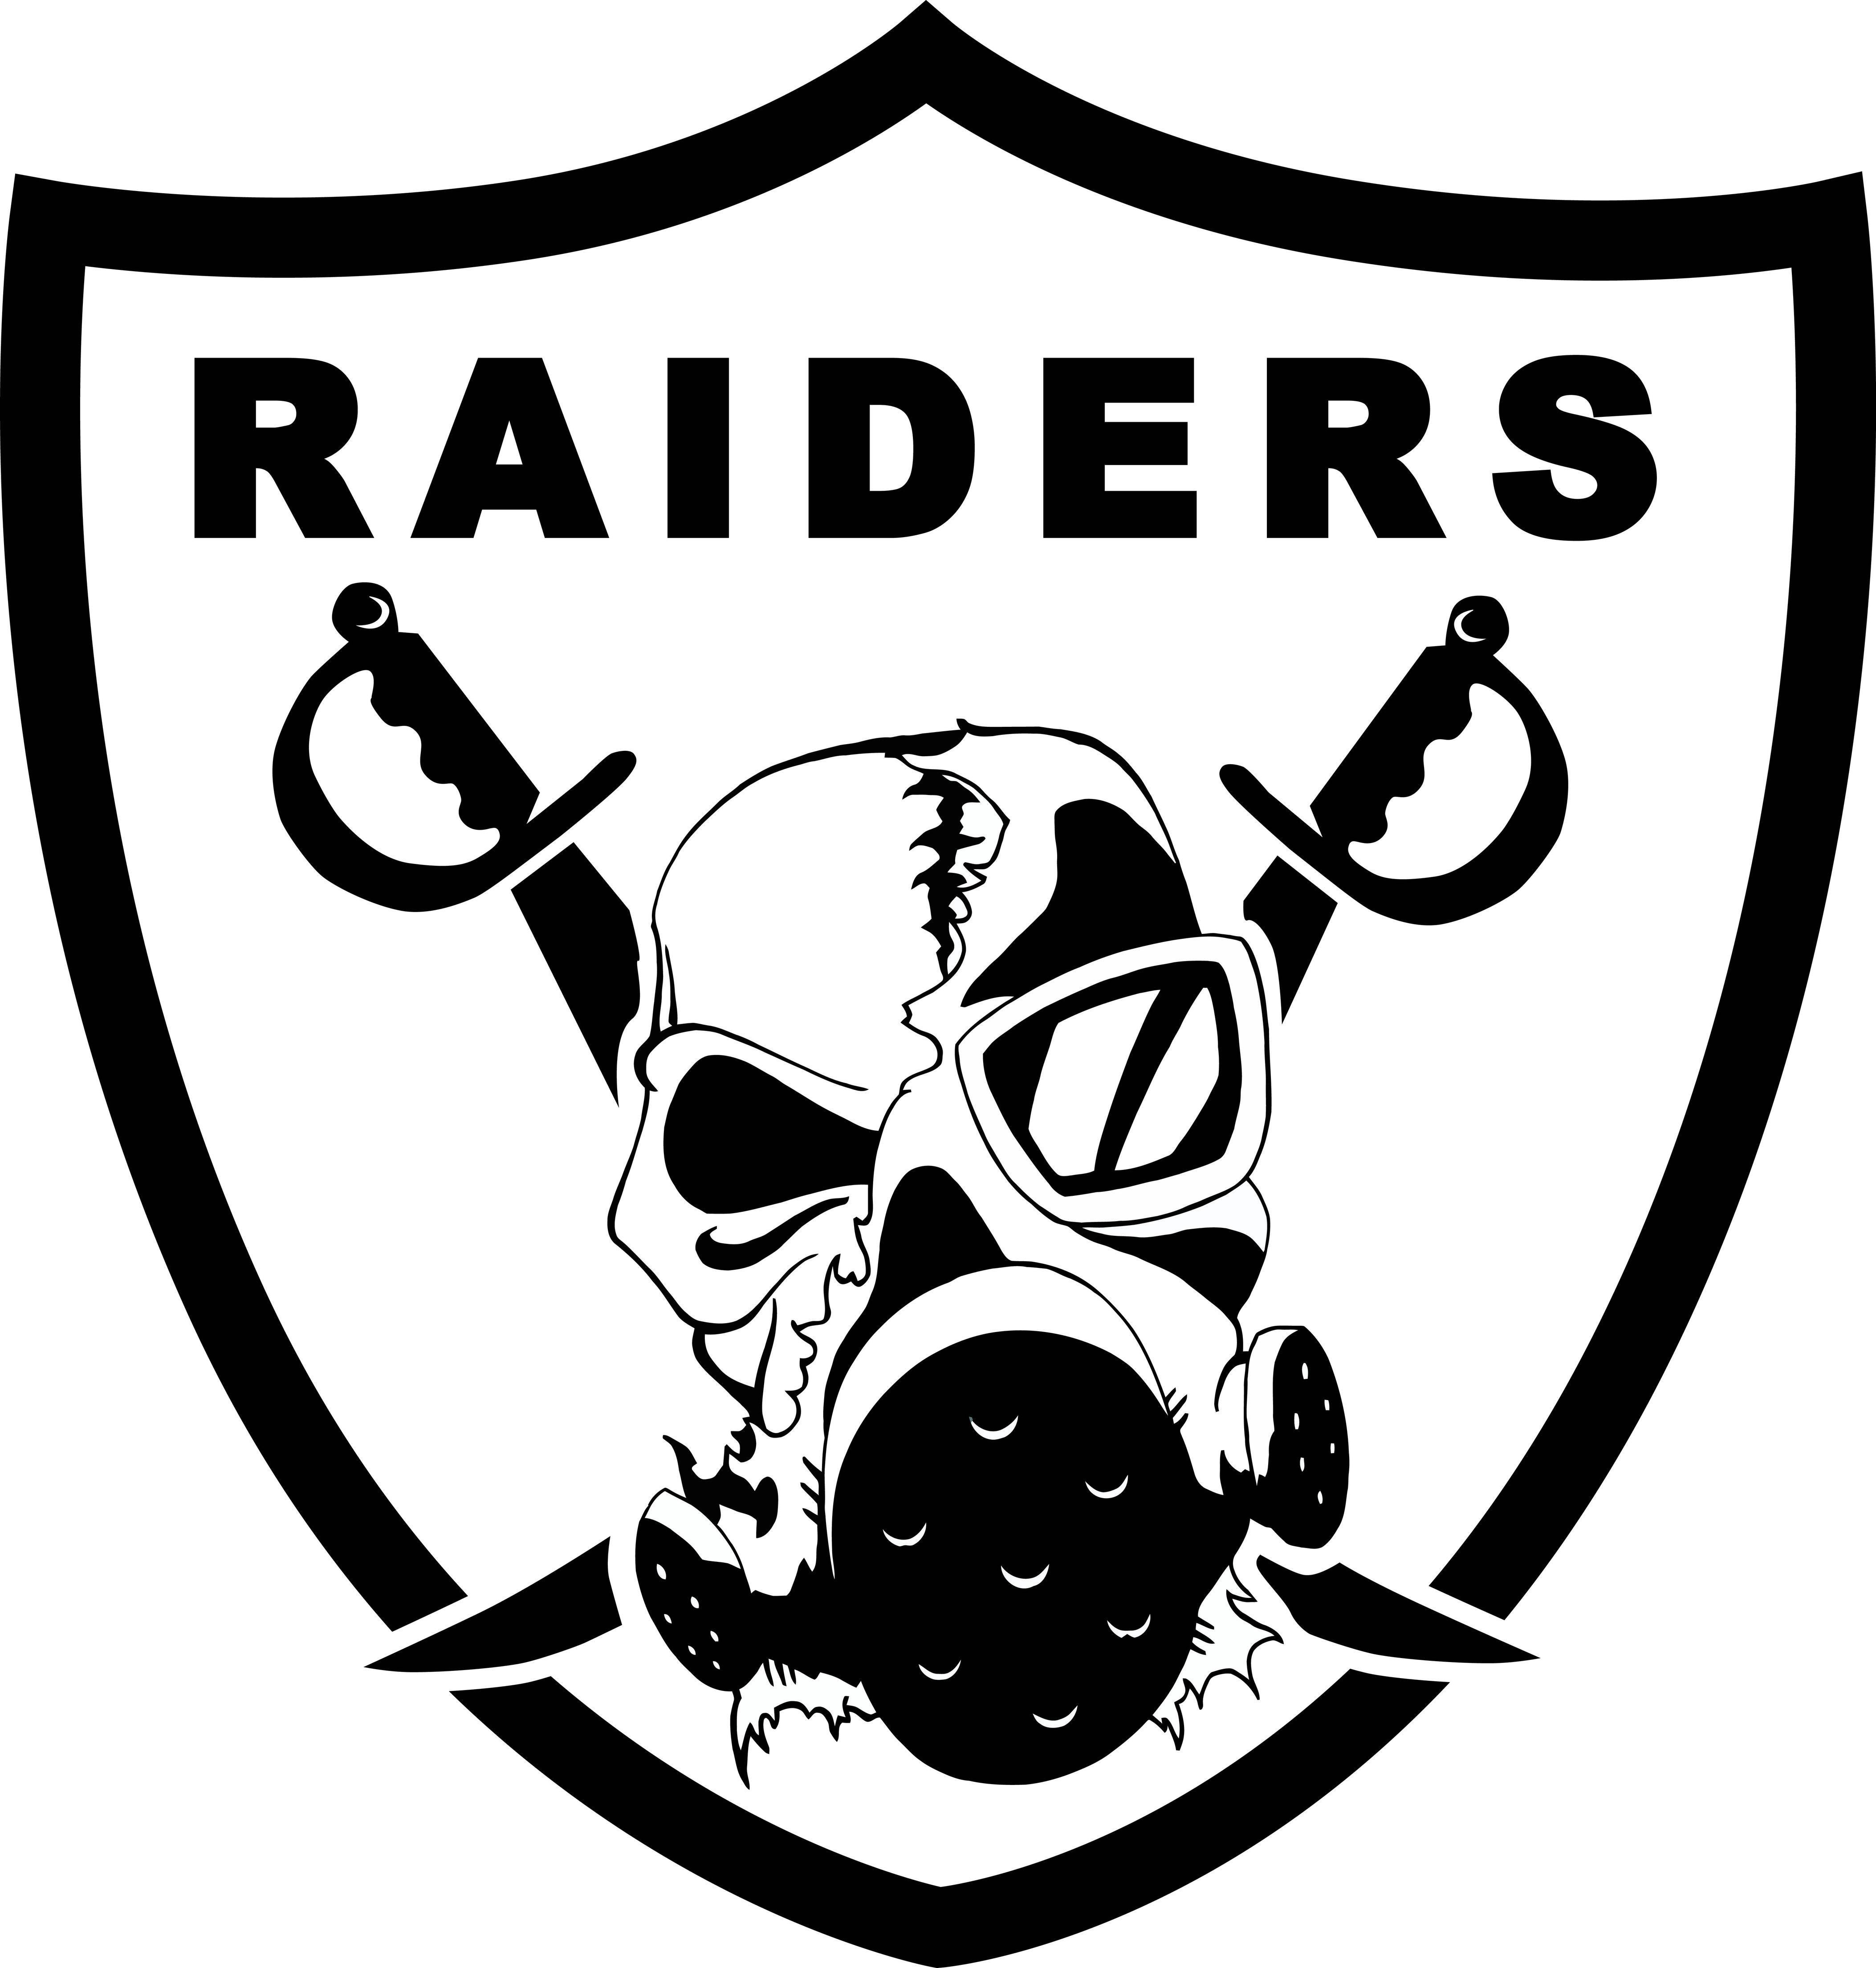 Cal fire logo black and white clipart jpg black and white download Clipart black and white raiders logo - ClipartFest jpg black and white download